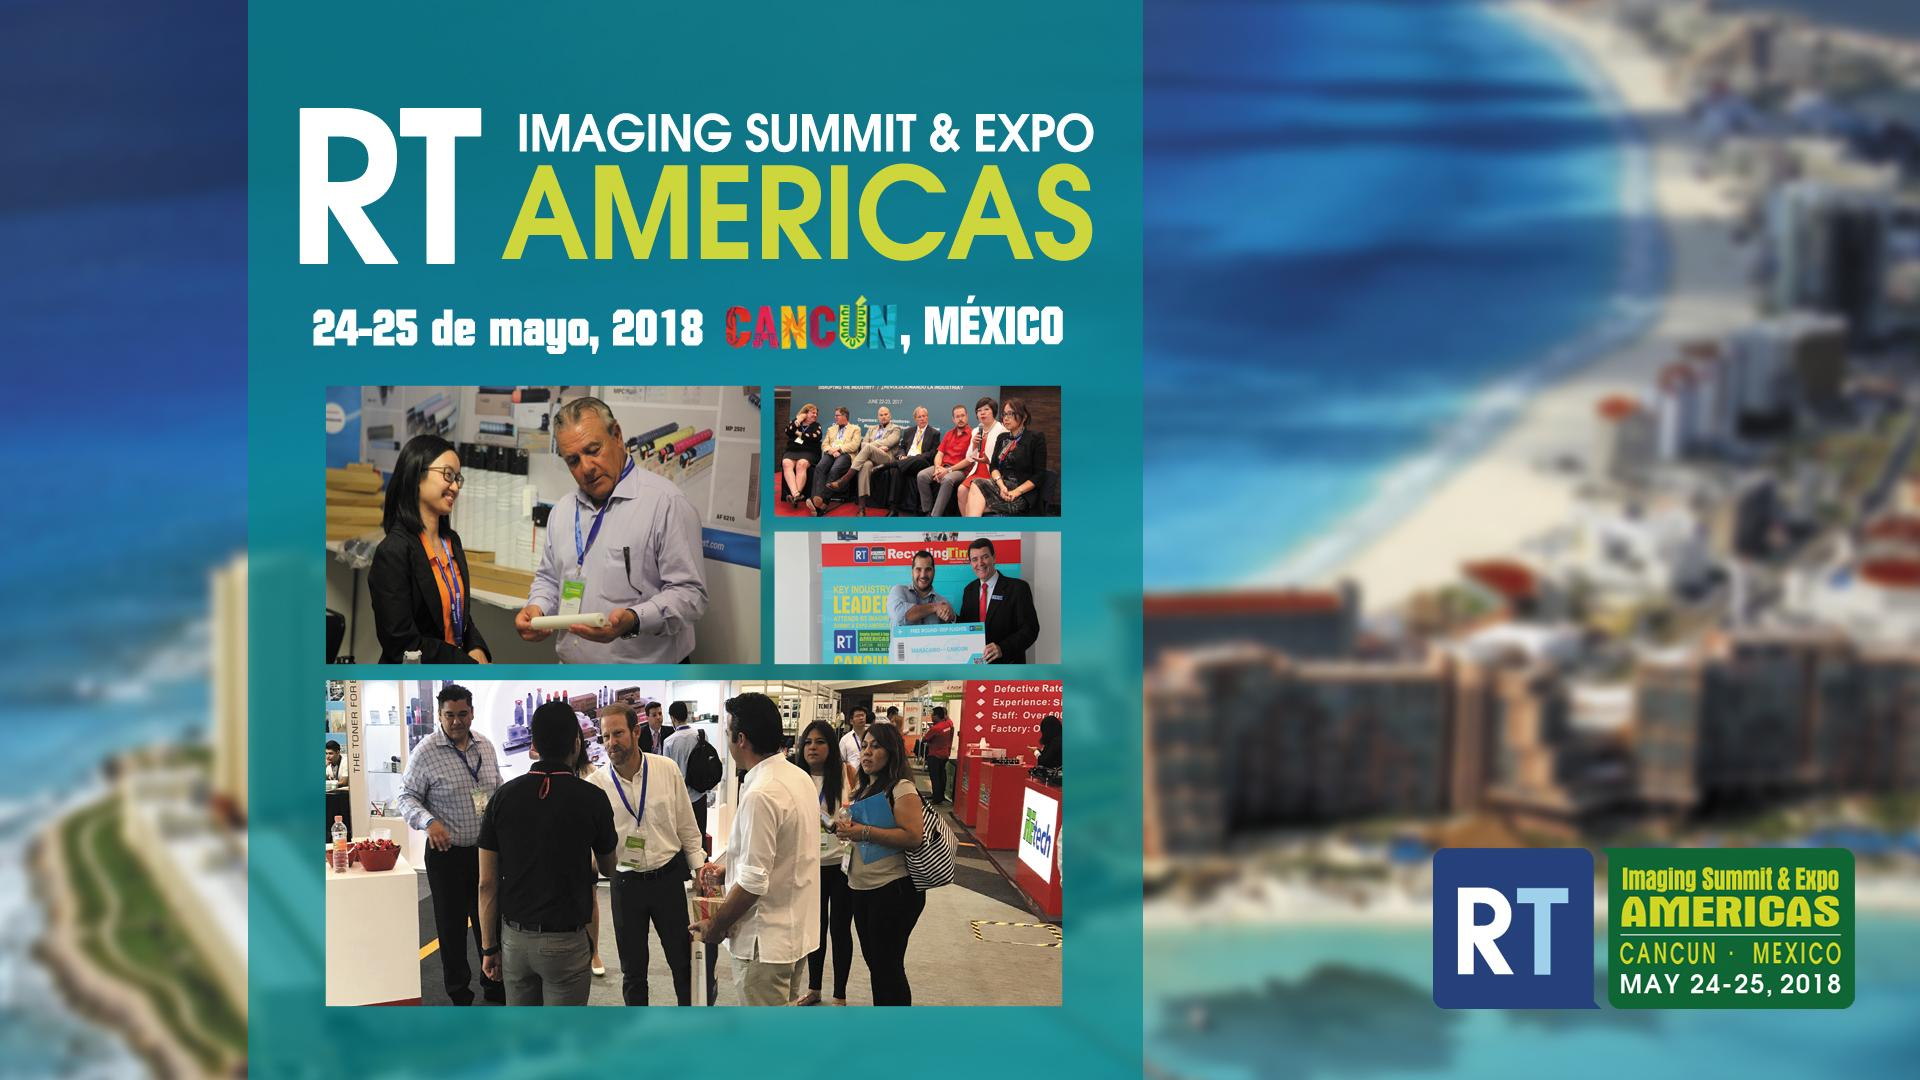 RT Imaging Summit & Expo—Américas 2018